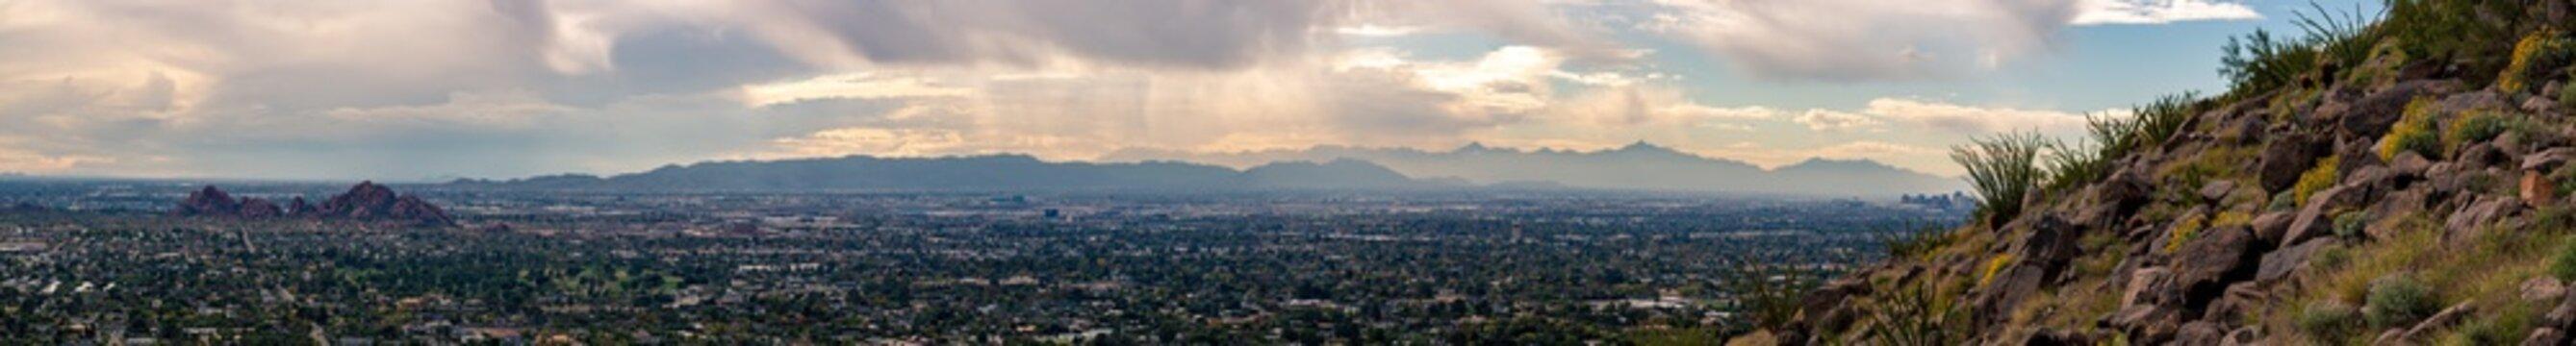 Scottsdale Panorama